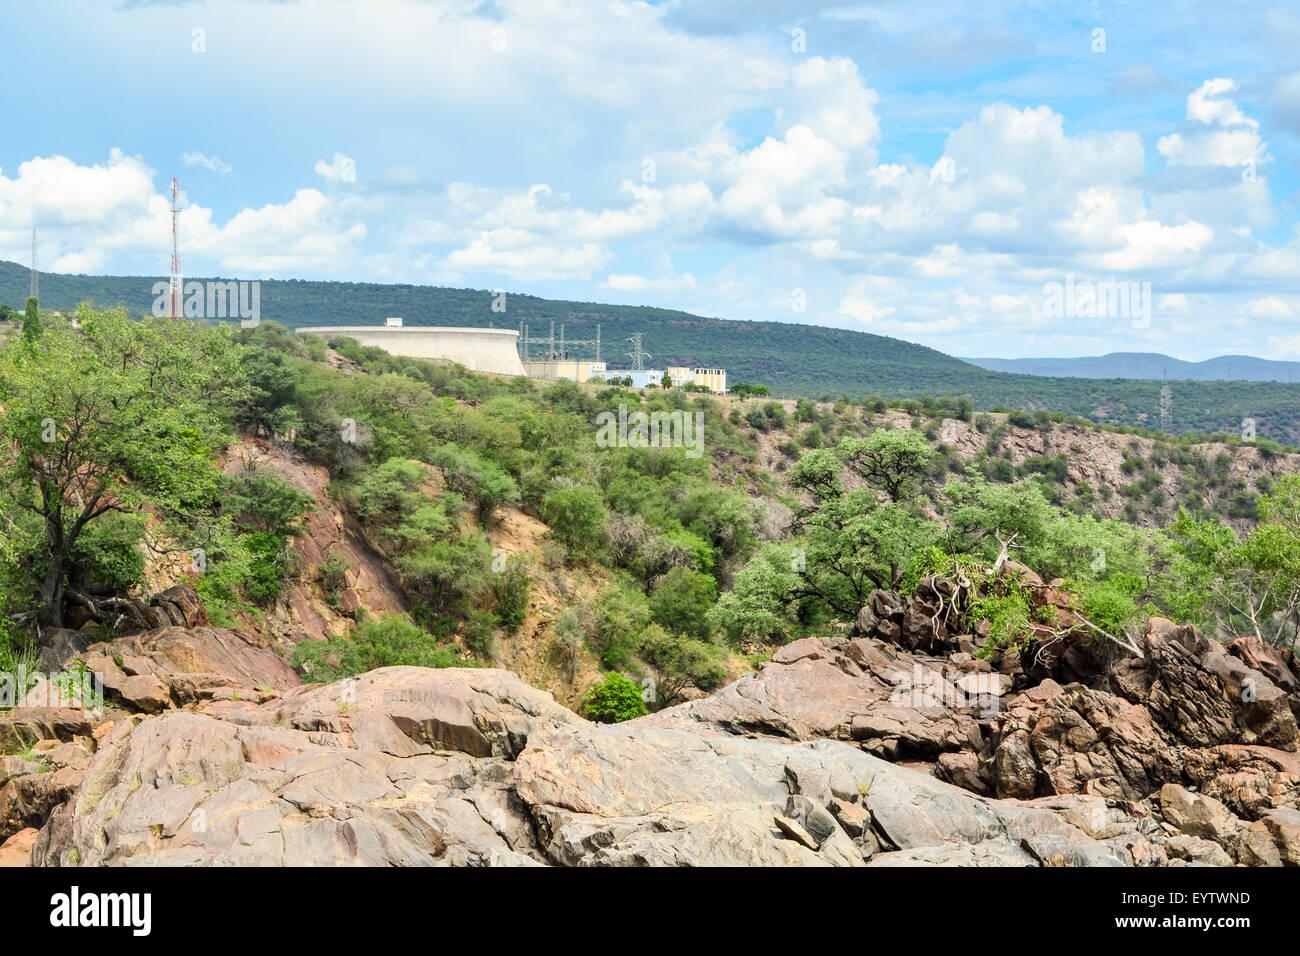 NAMPOWER power station at Ruacana dam, at the border Angola/Namibia - Stock Image